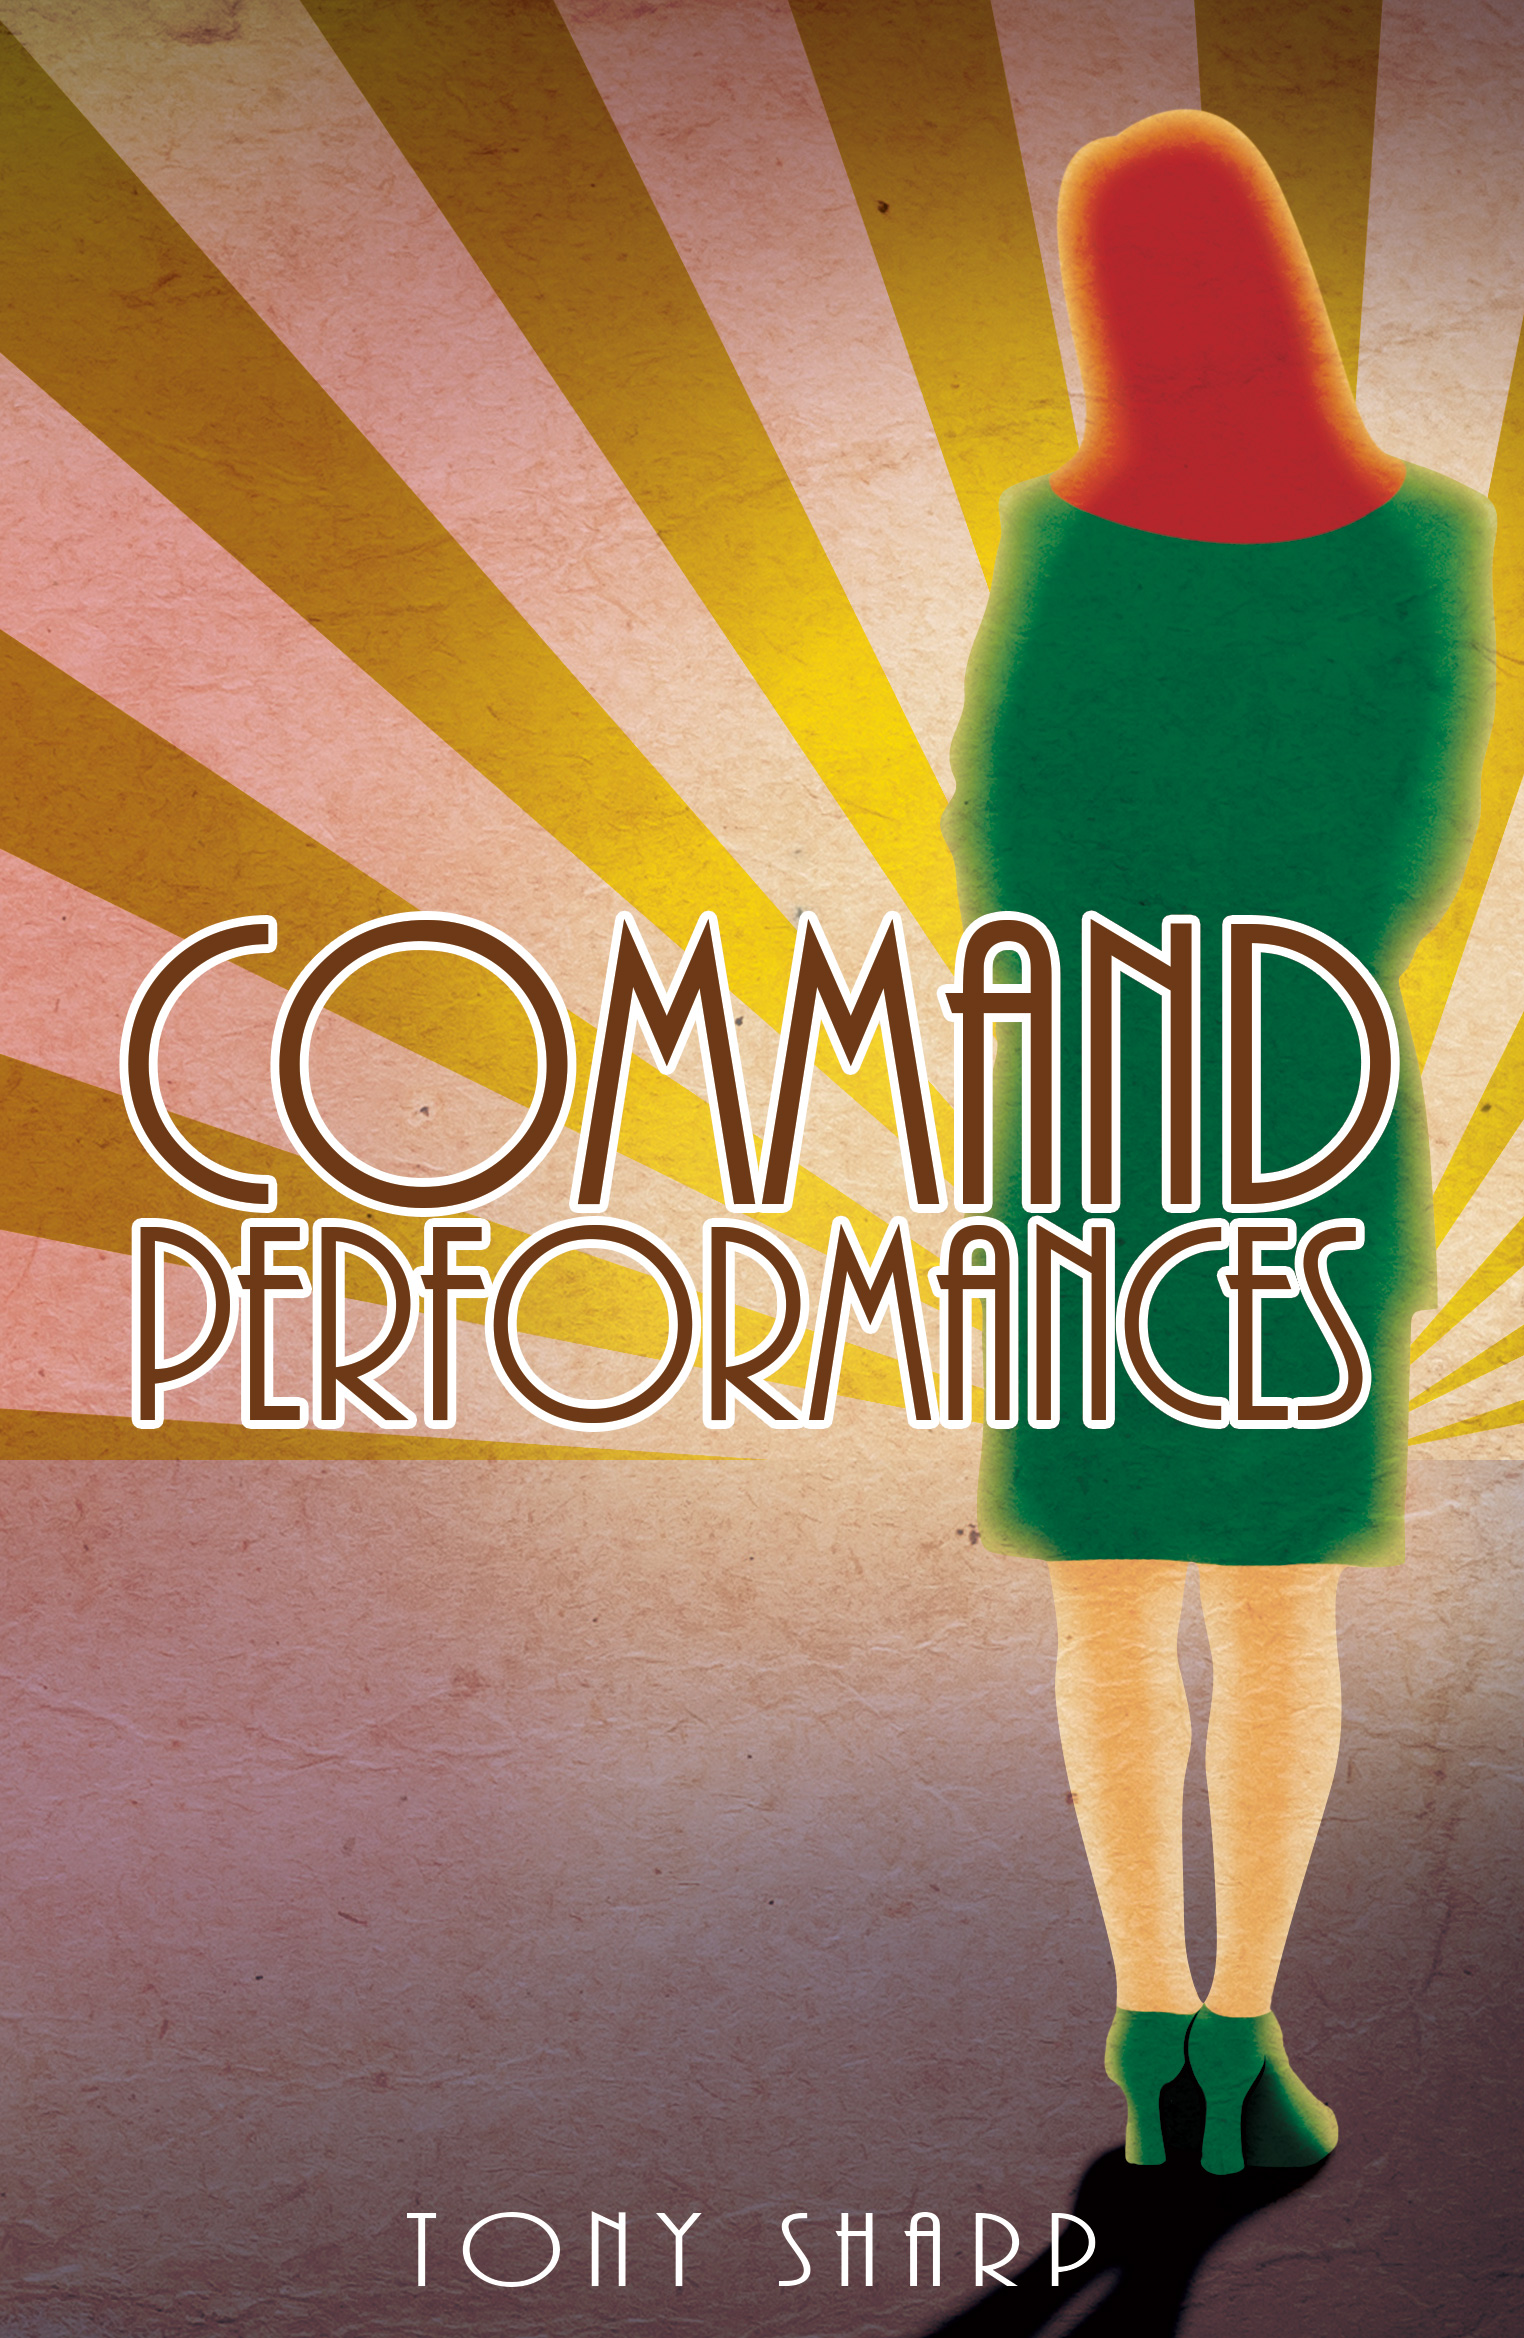 Command Performances